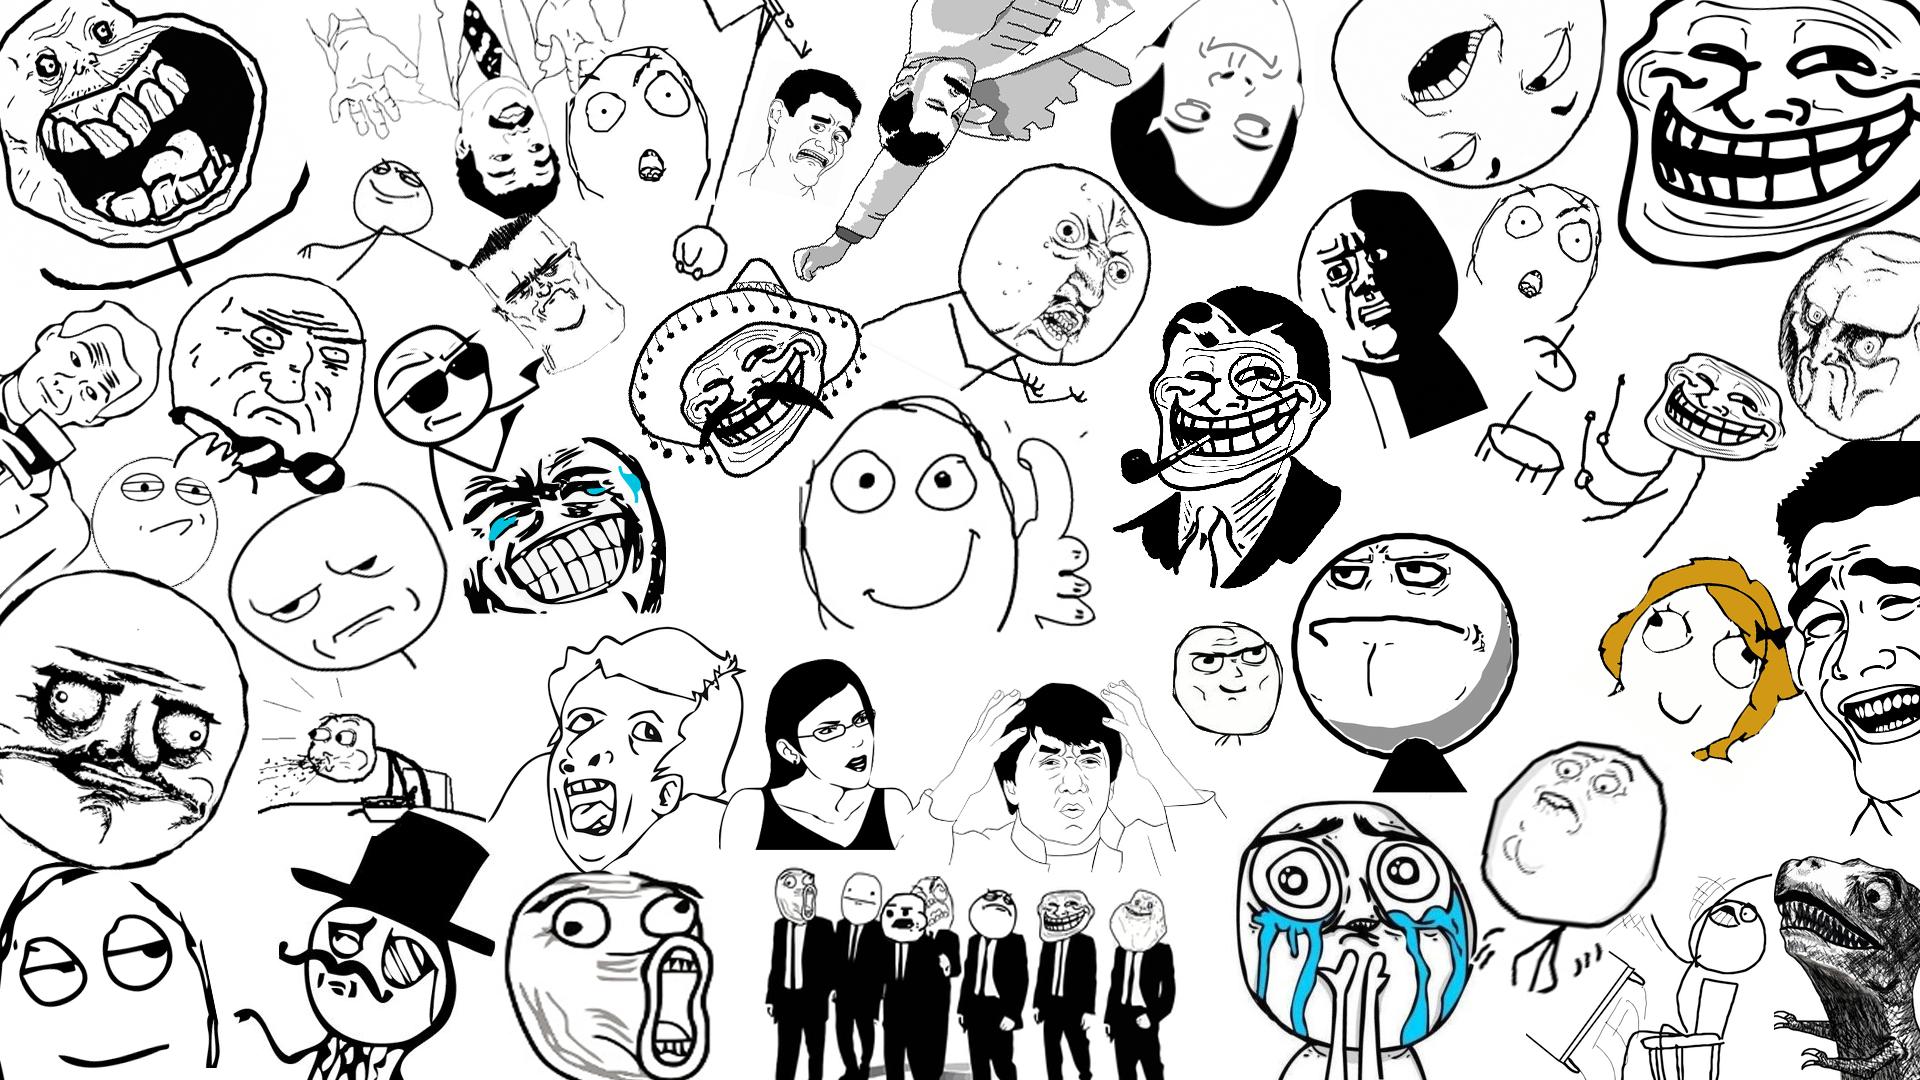 Download Meme Faces Wallpaper HD 2938 Full Size 1920x1080